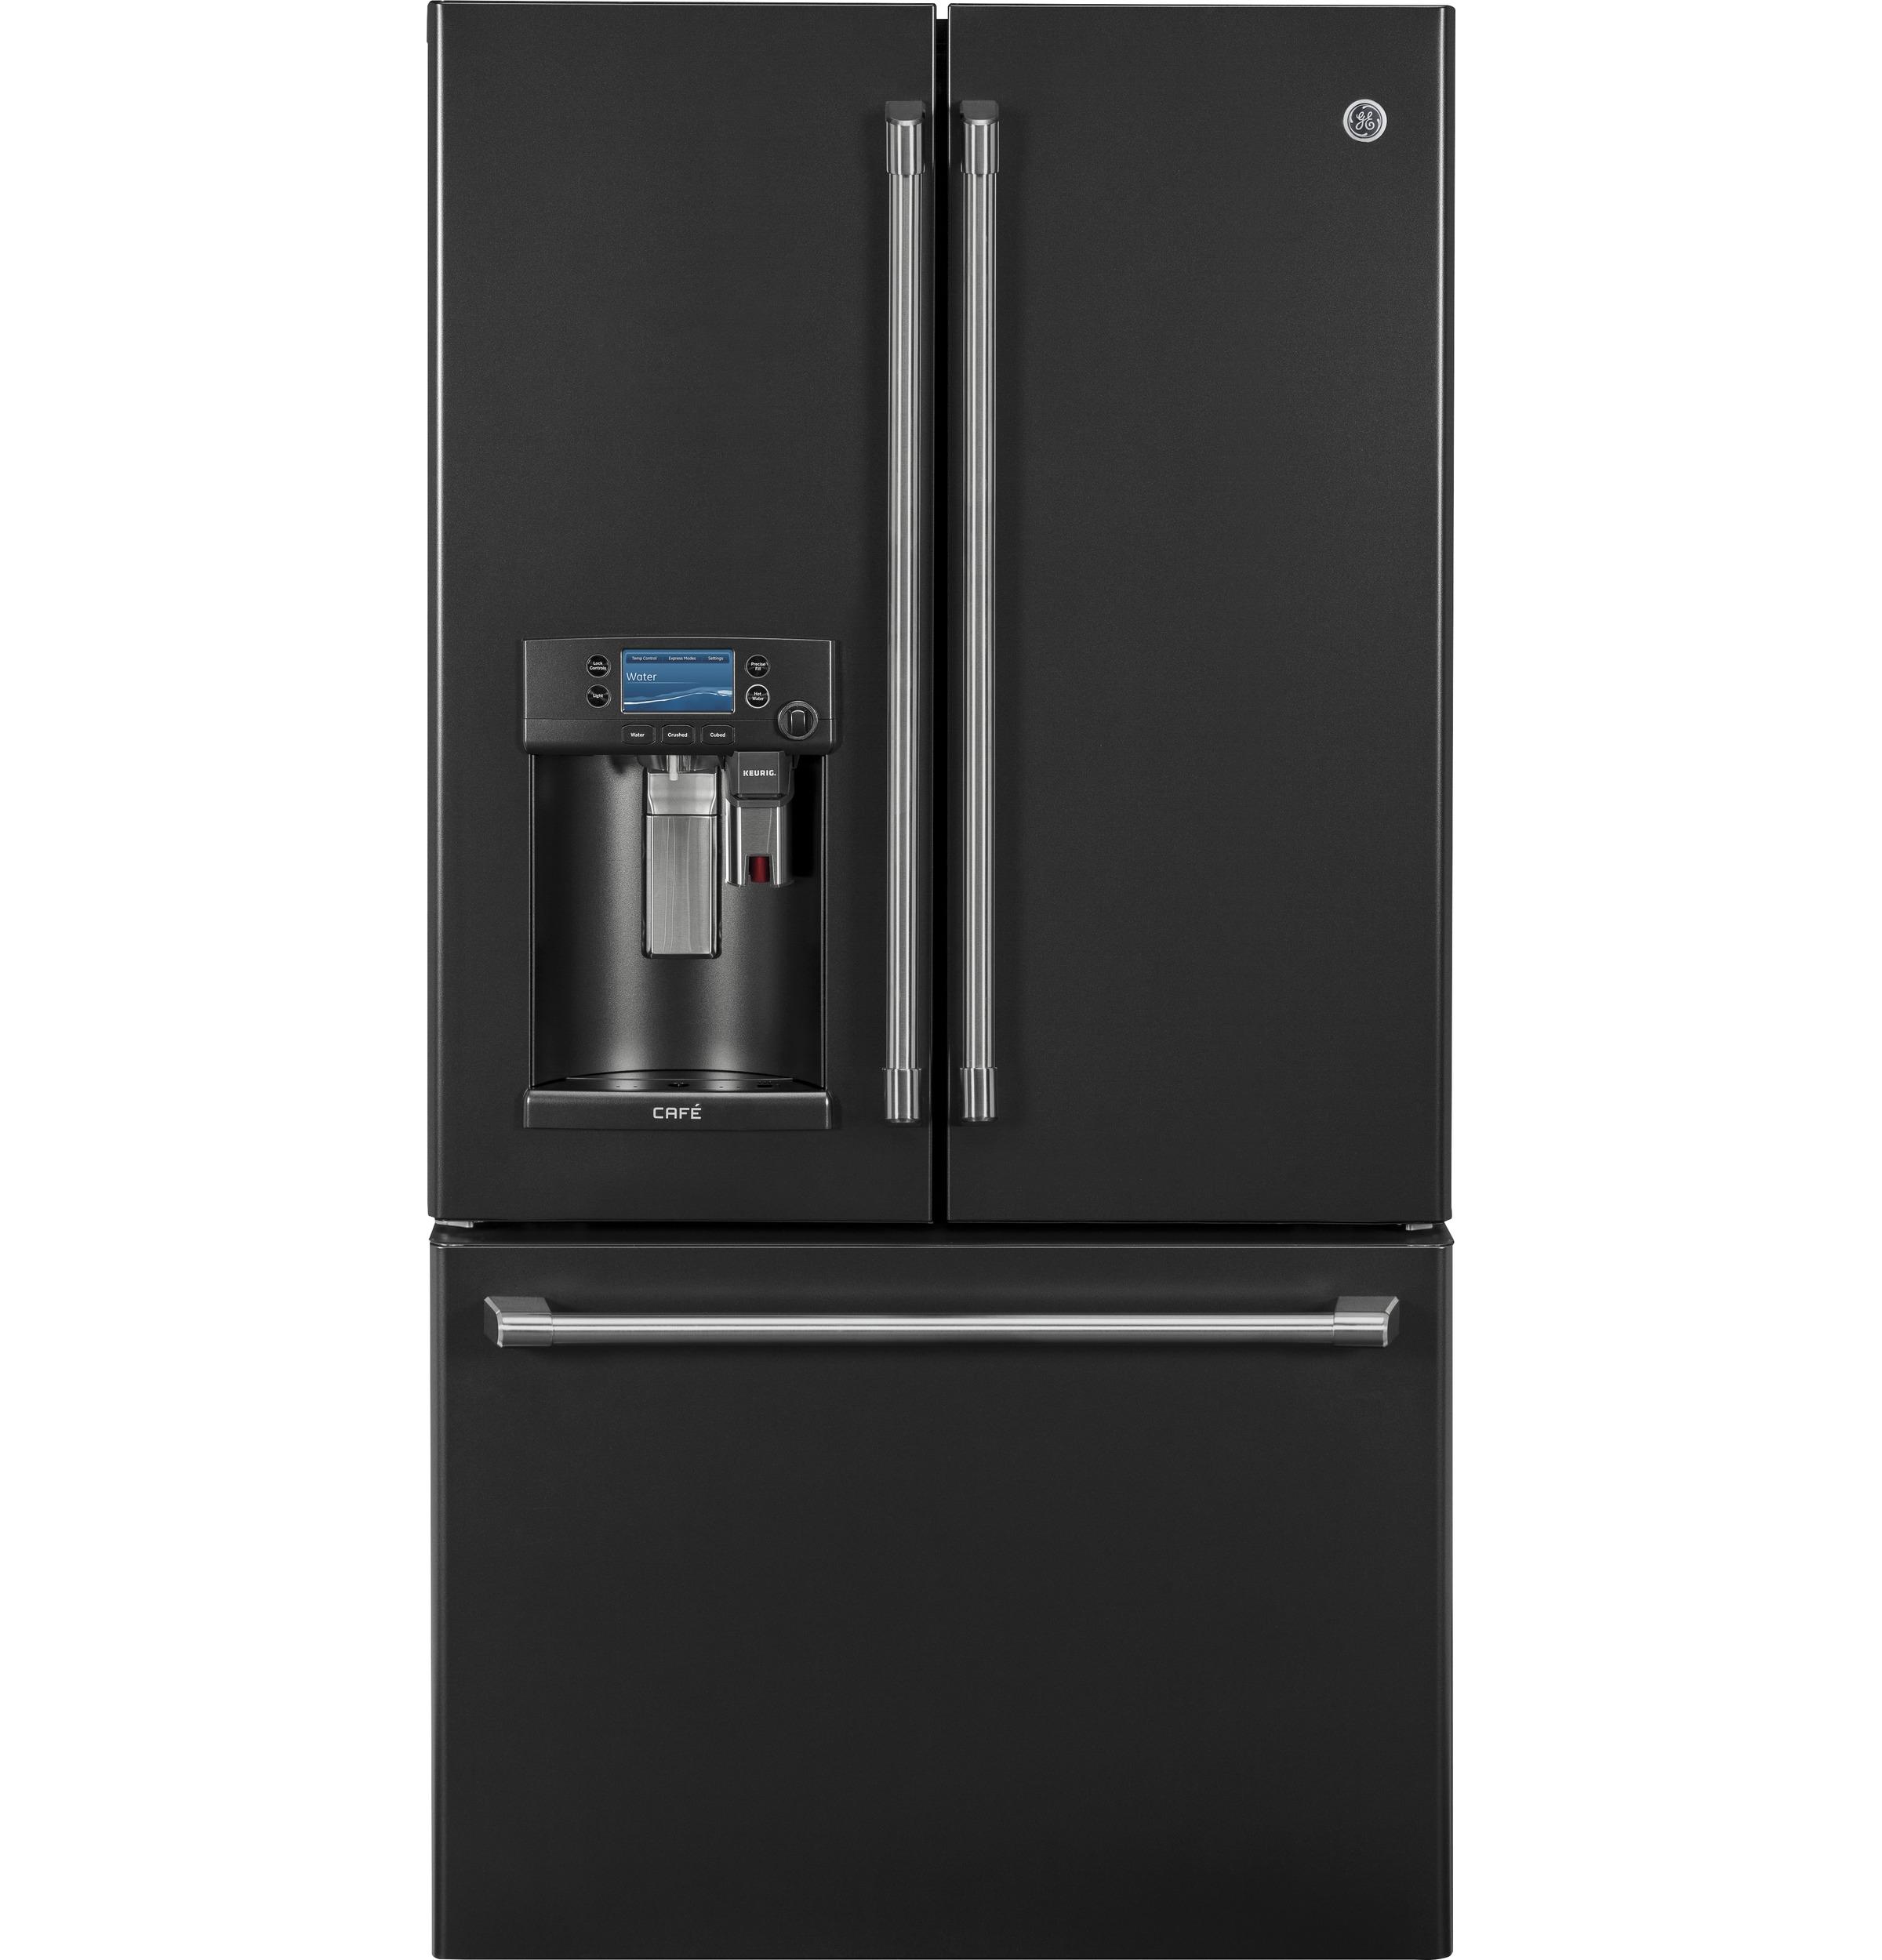 GE Café™ Series ® 22.2 Cu. Ft. Counter-Depth French-Door Refrigerator with Keurig® K-Cup®